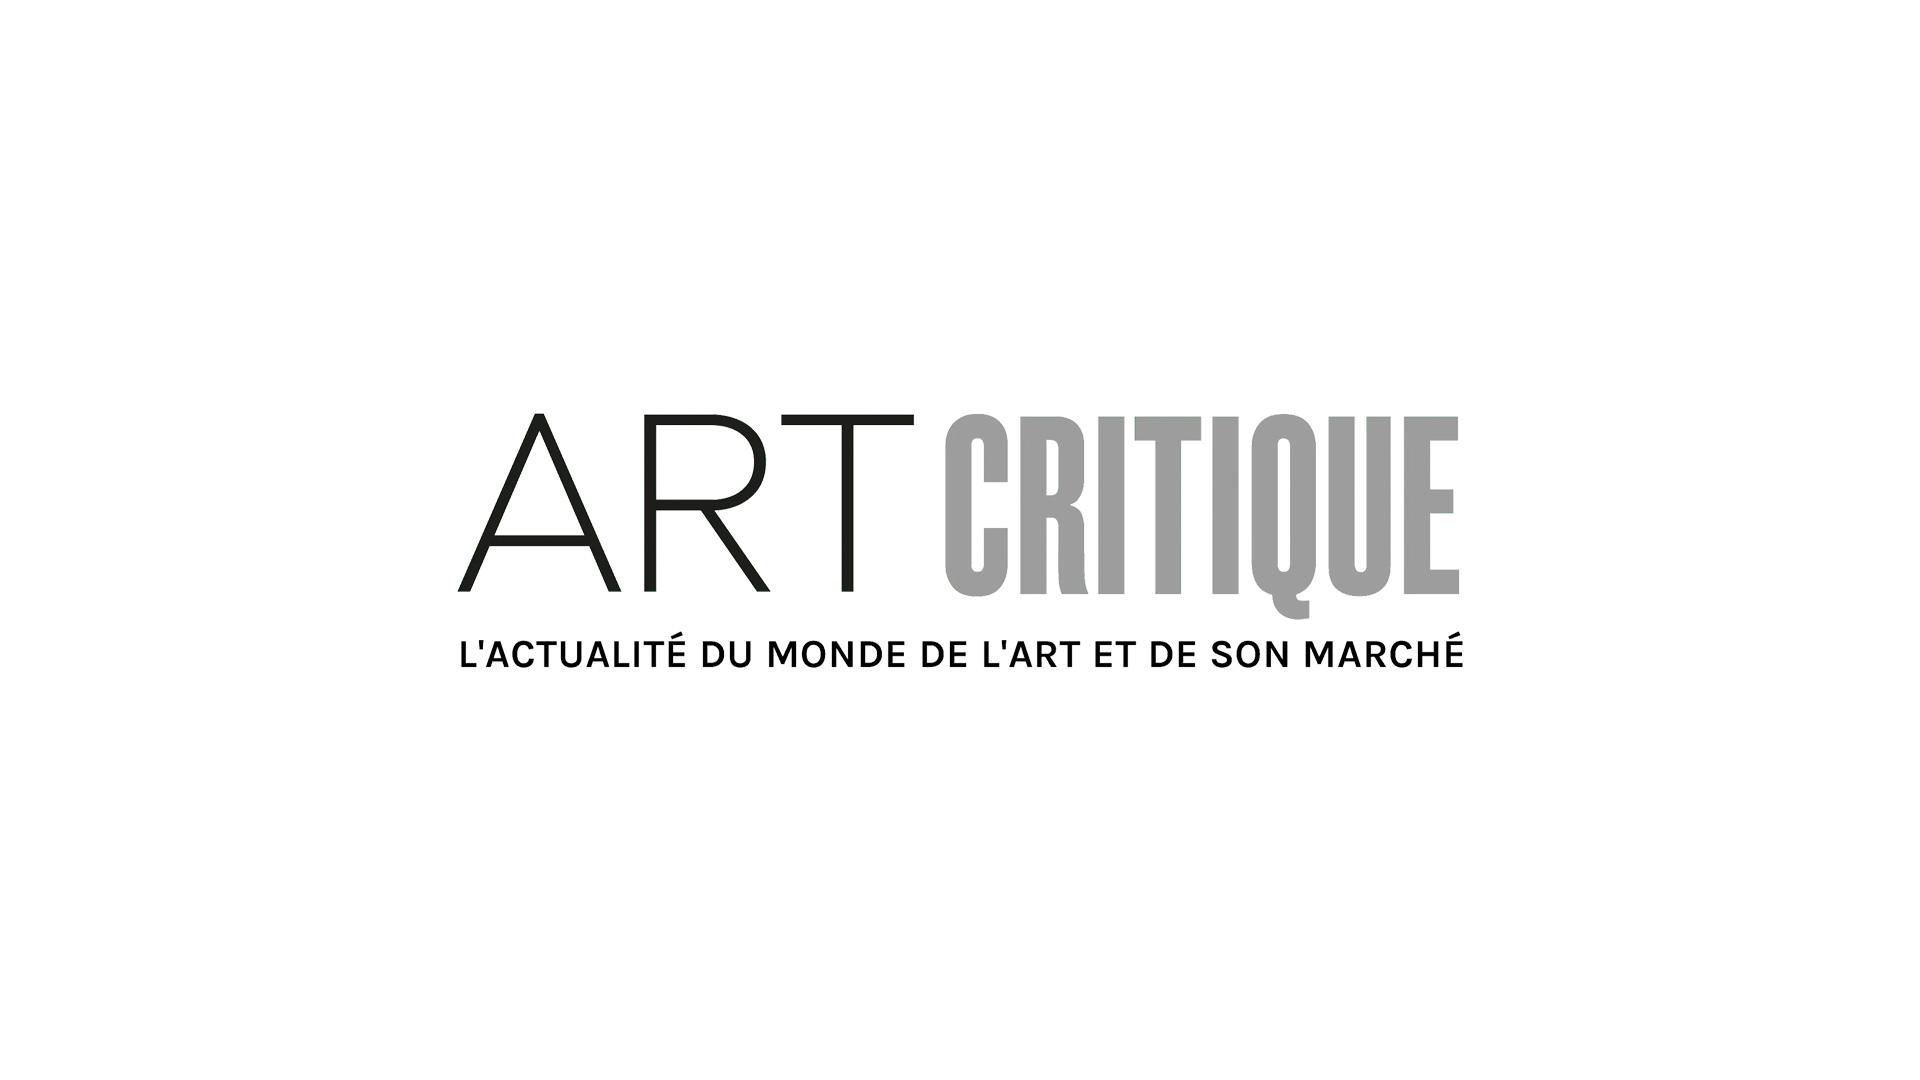 Italy hits architect Santiago Calatrava with €78,000 in fines